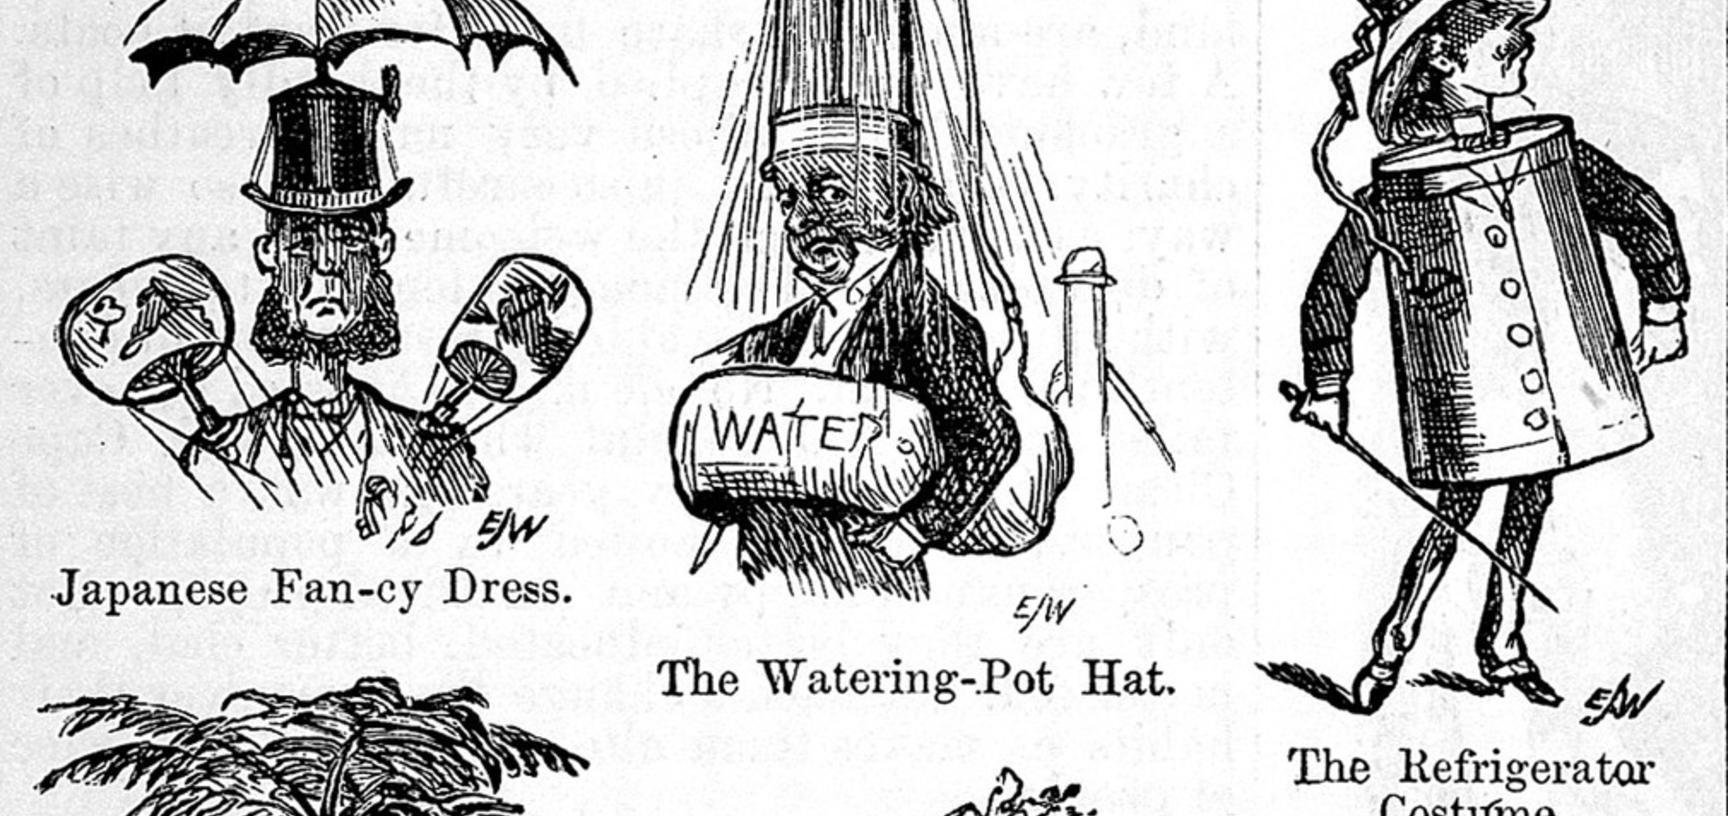 For the hot-headed. Illustrating hats to prevent sun-stroke.